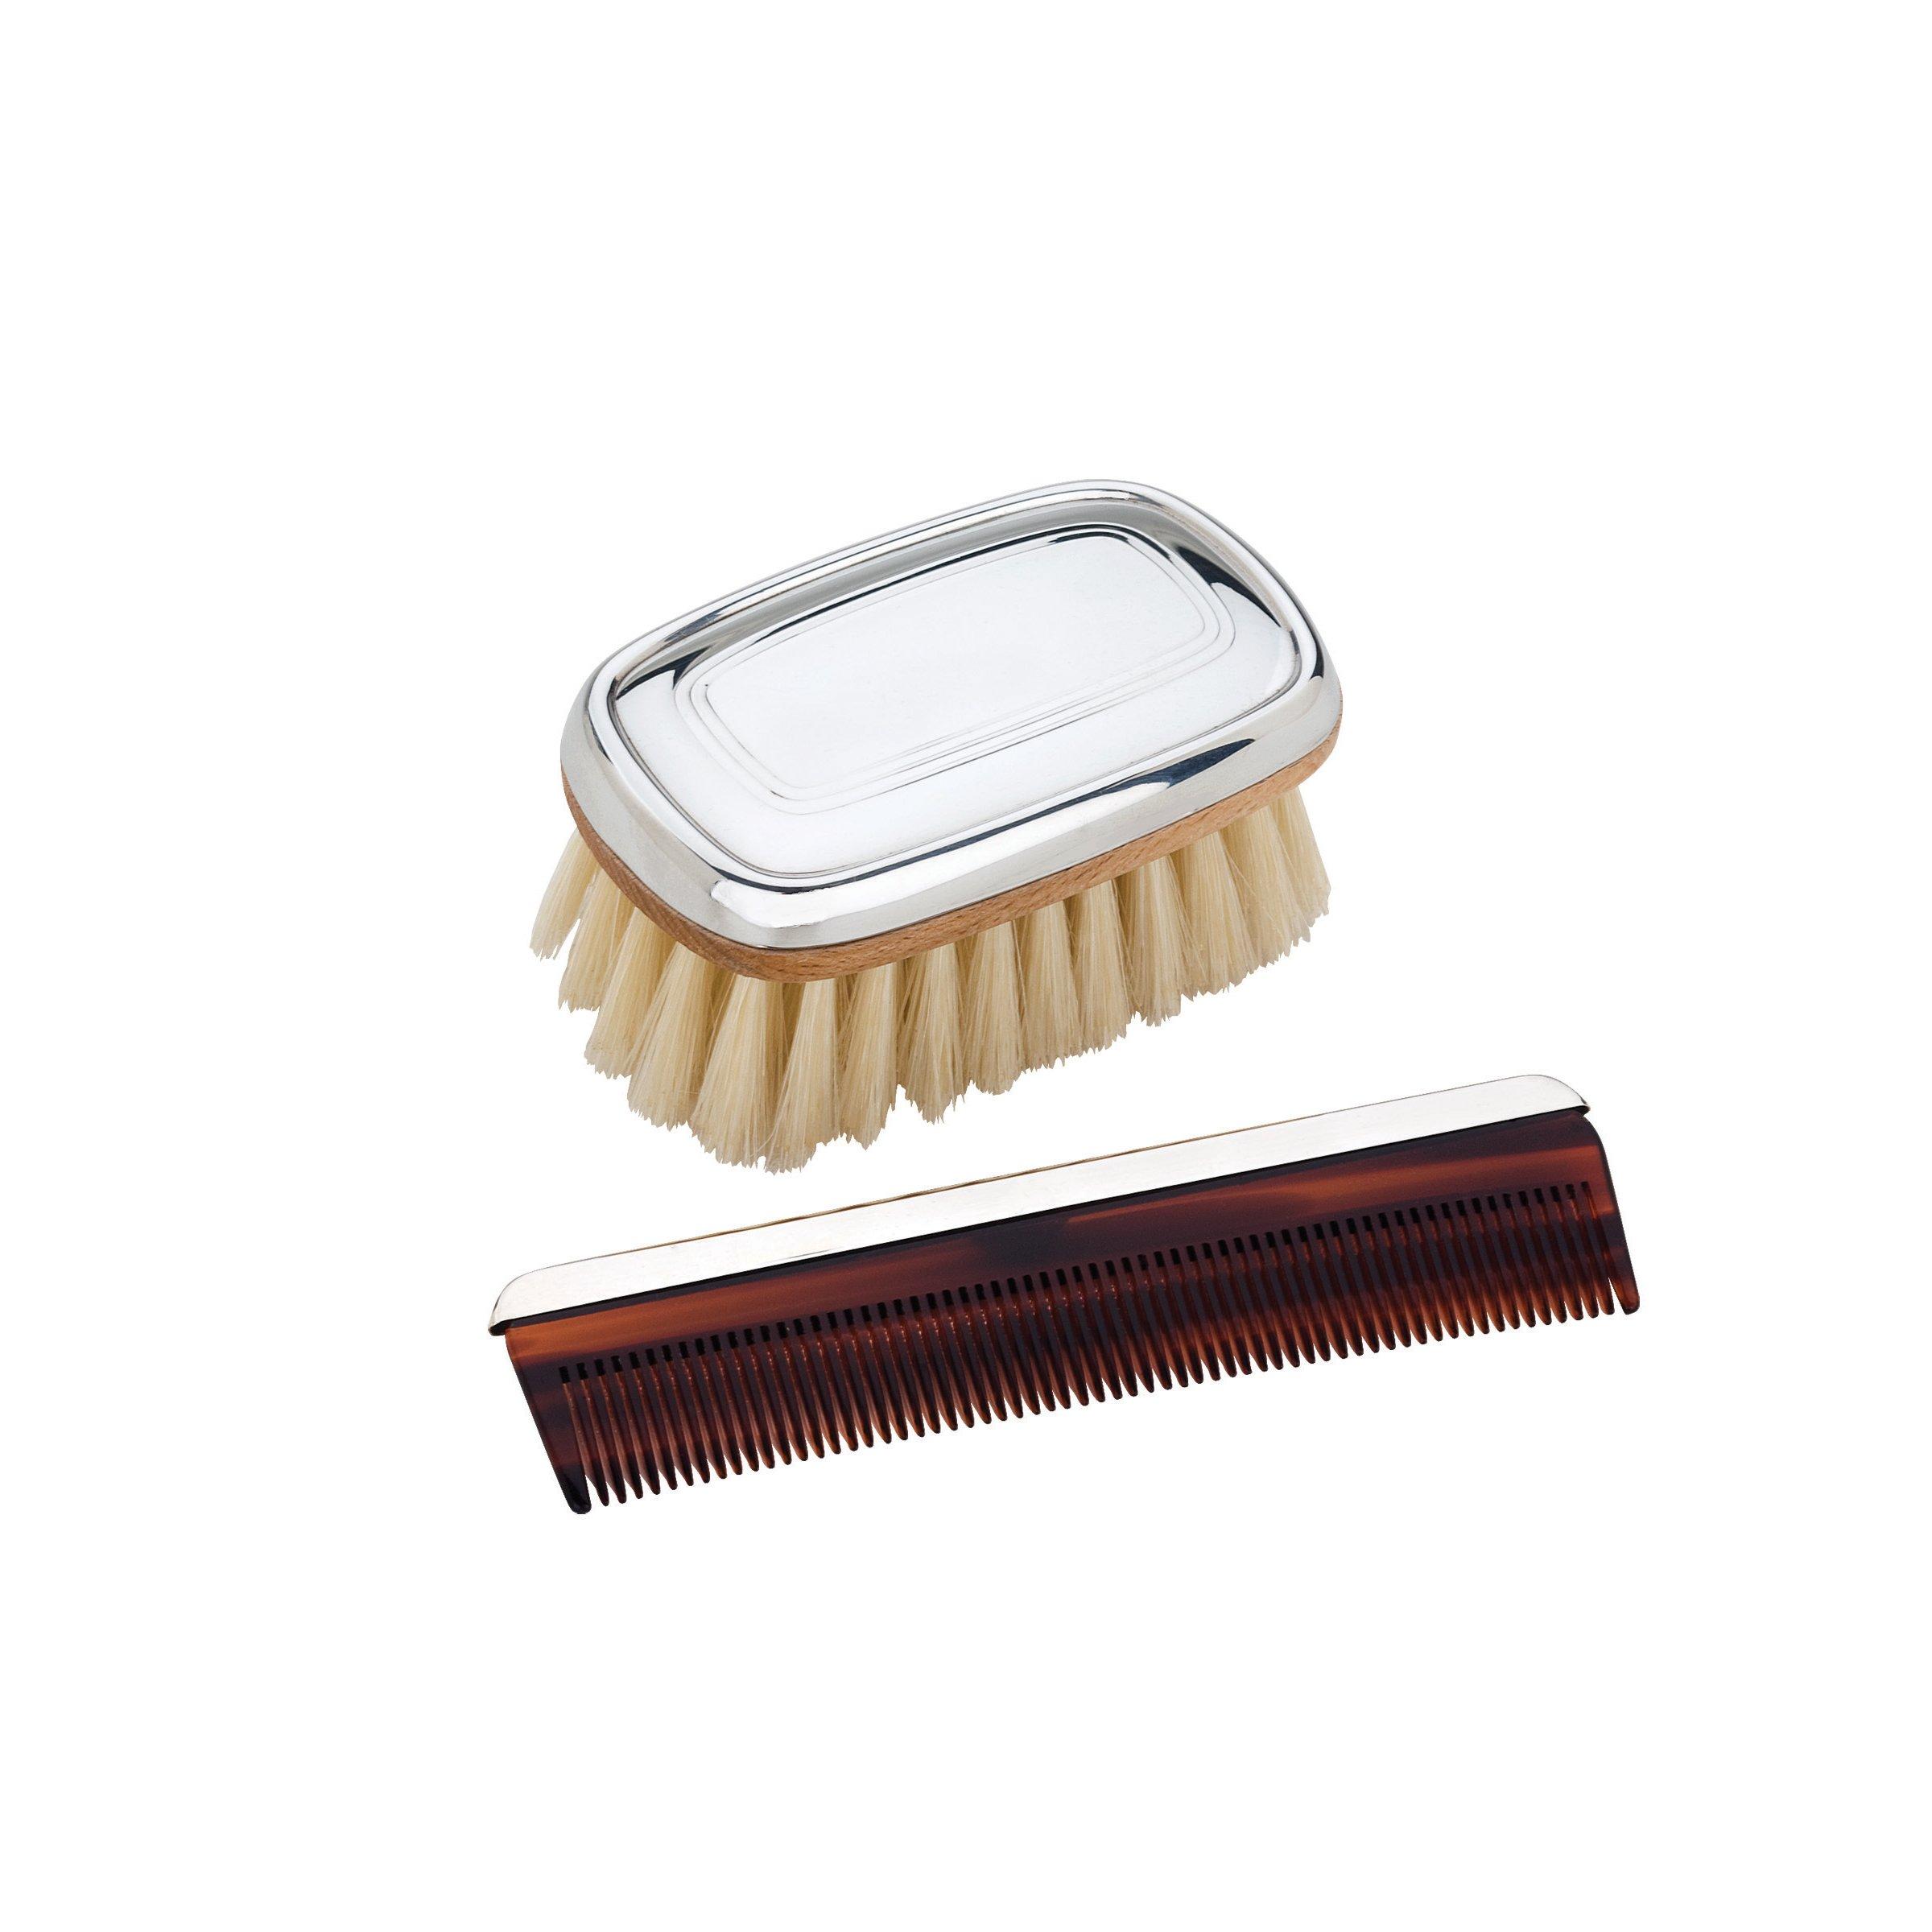 Reed & Barton Pewter Brush and Comb Set, Kent Boy's